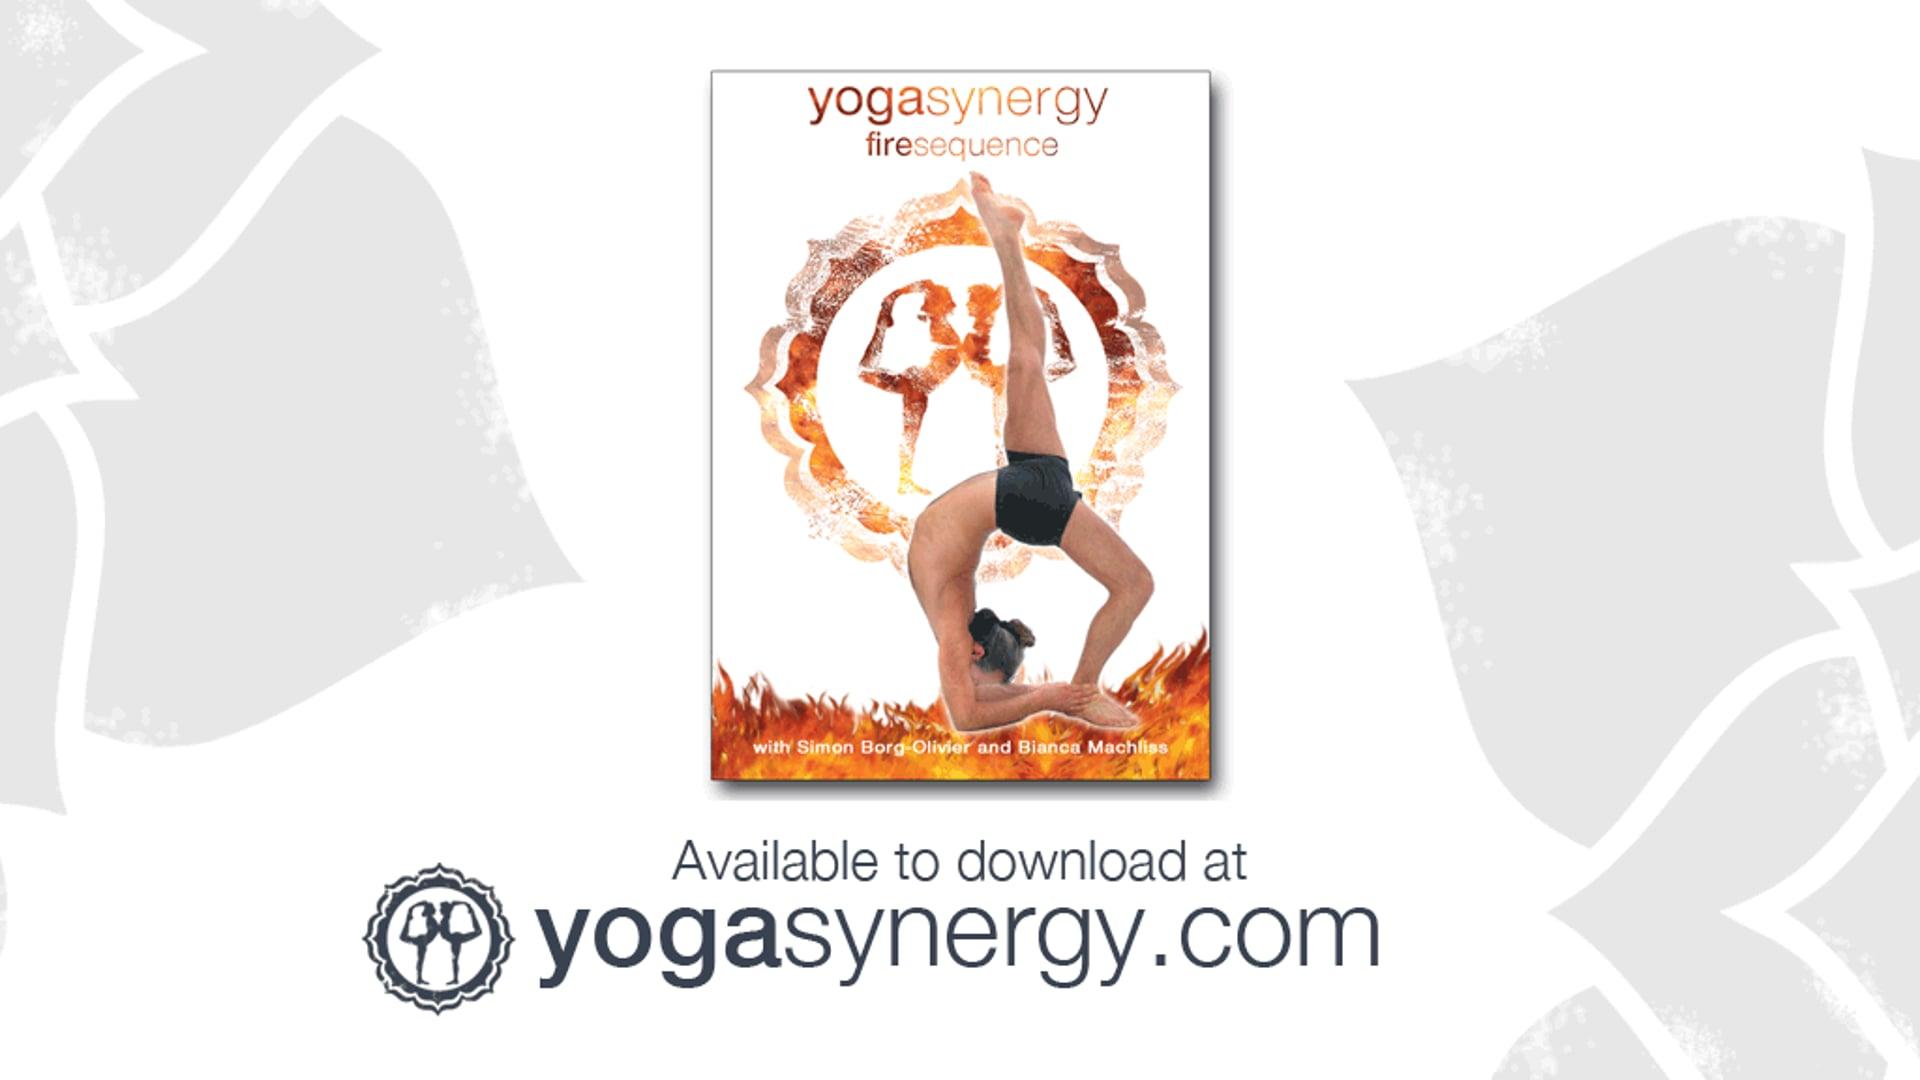 Yoga Synergy Fire Sequence